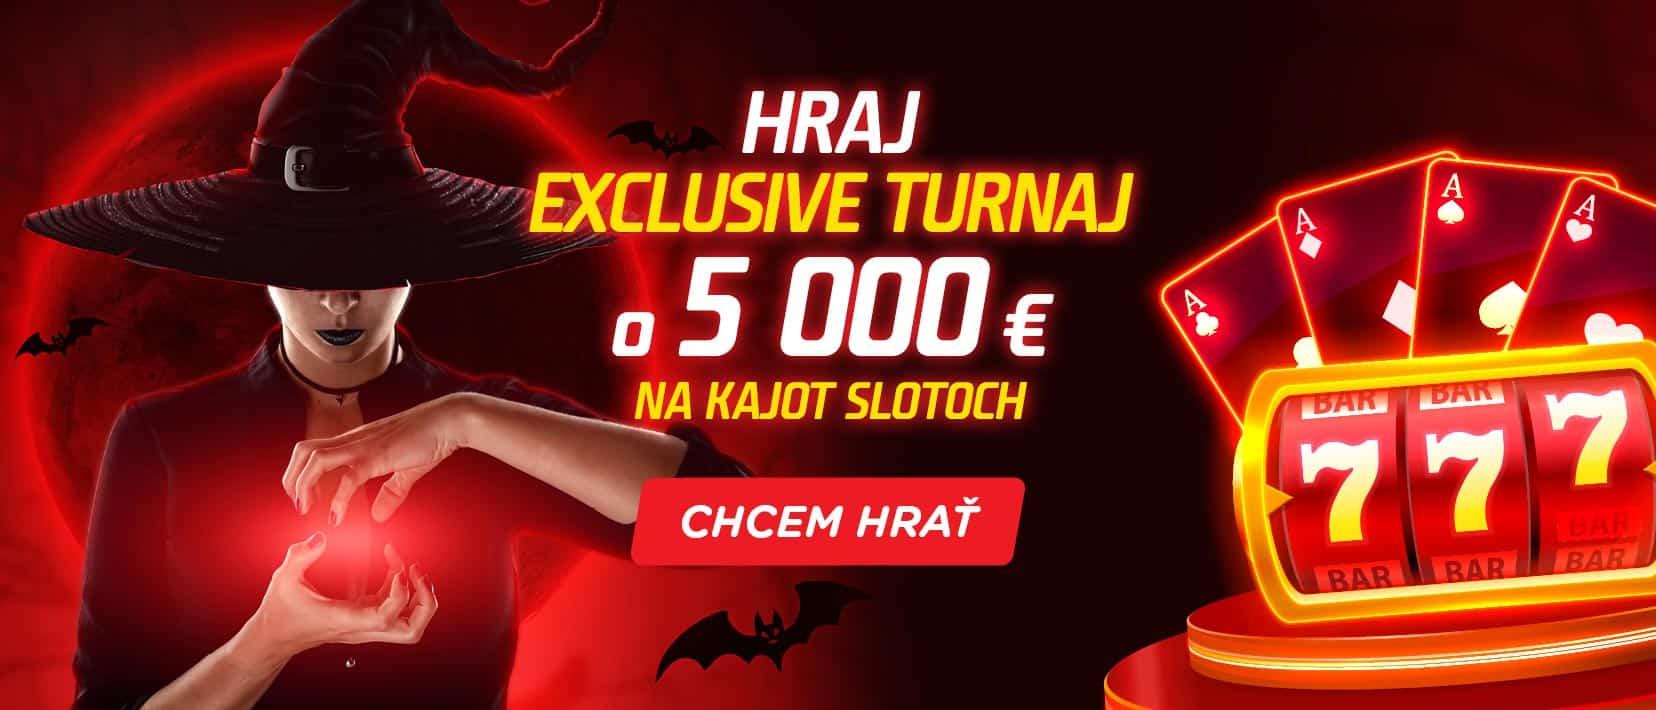 Exclusive turnaj v Kajot slotoch v eTIPOS kasíne - banner